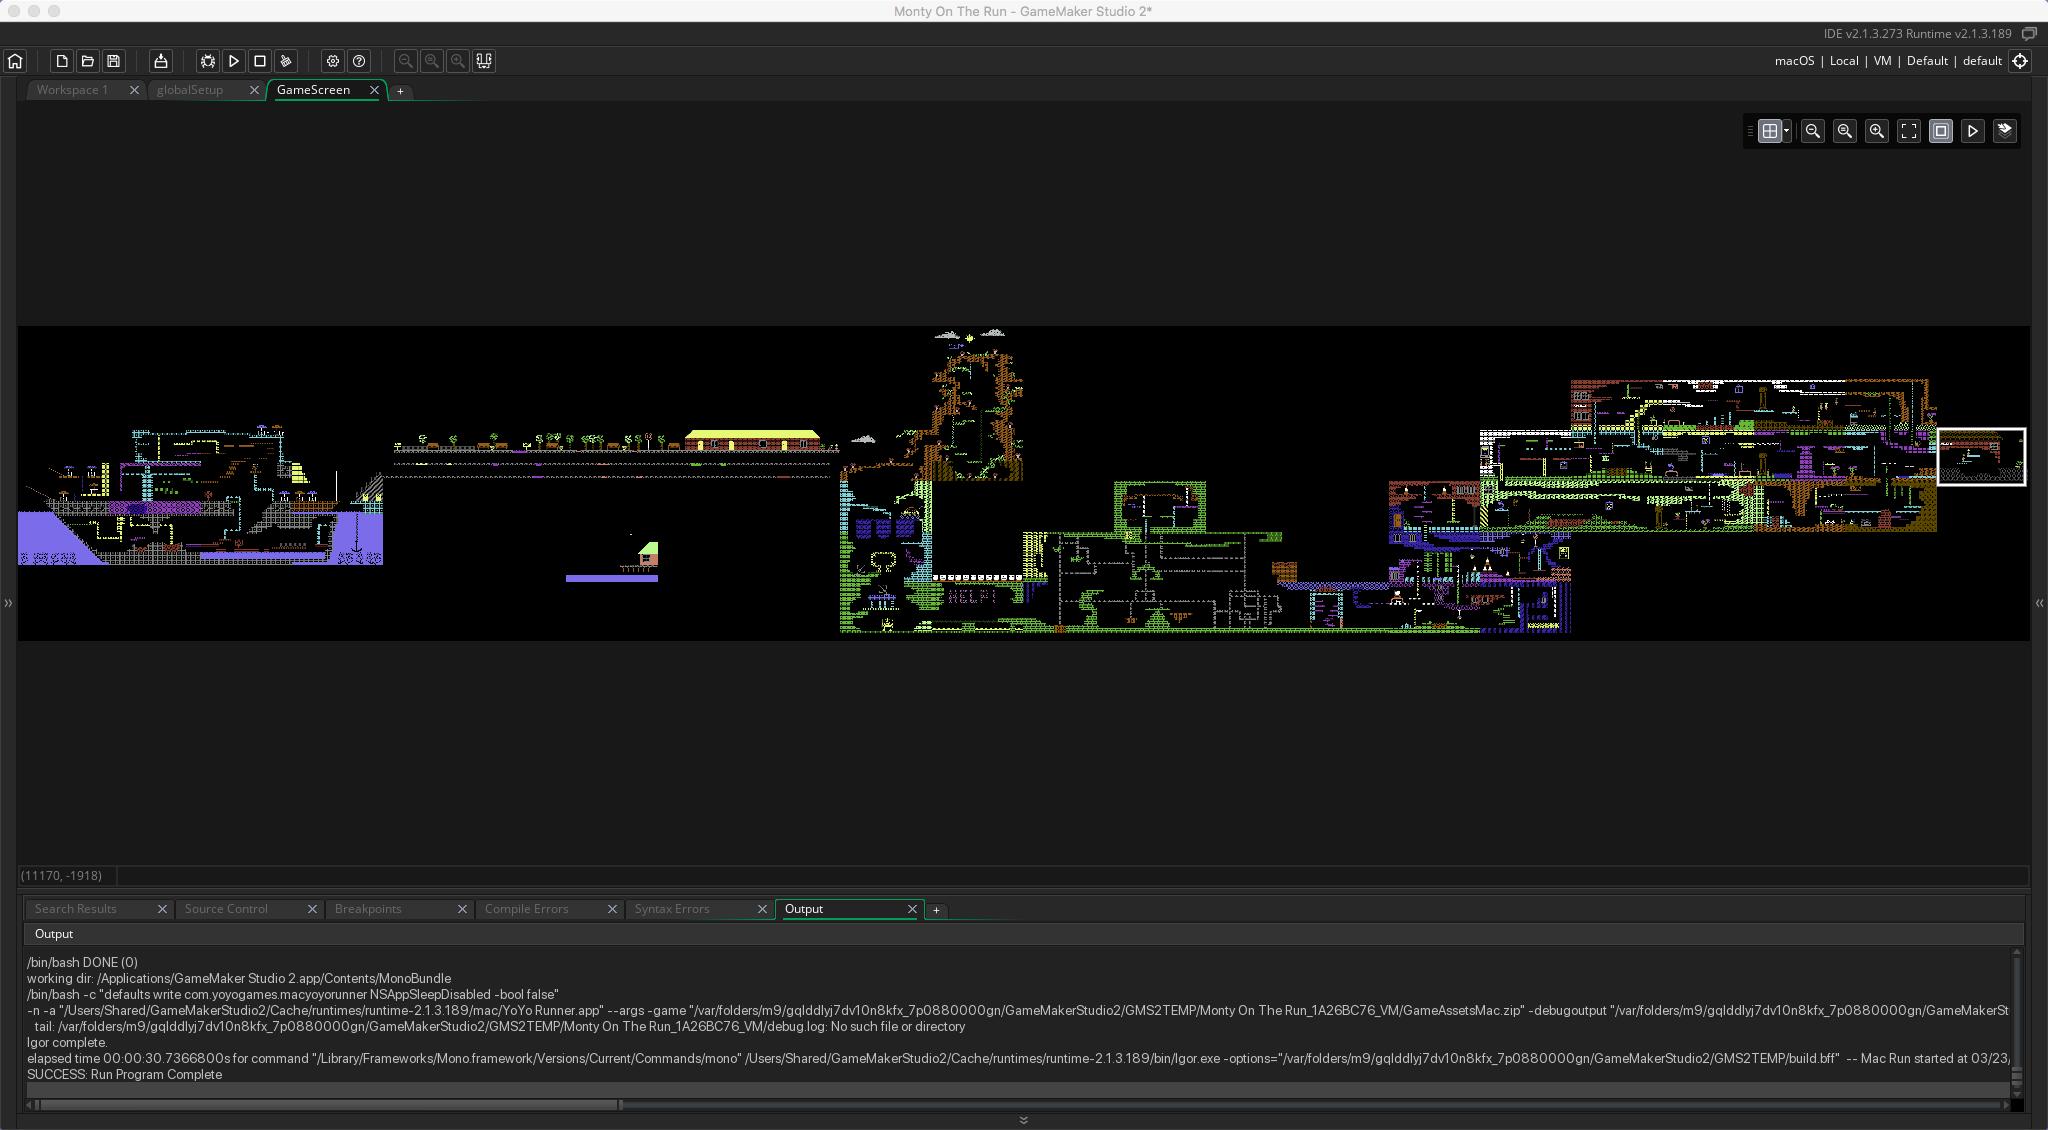 The game map inside Game Maker Studio.